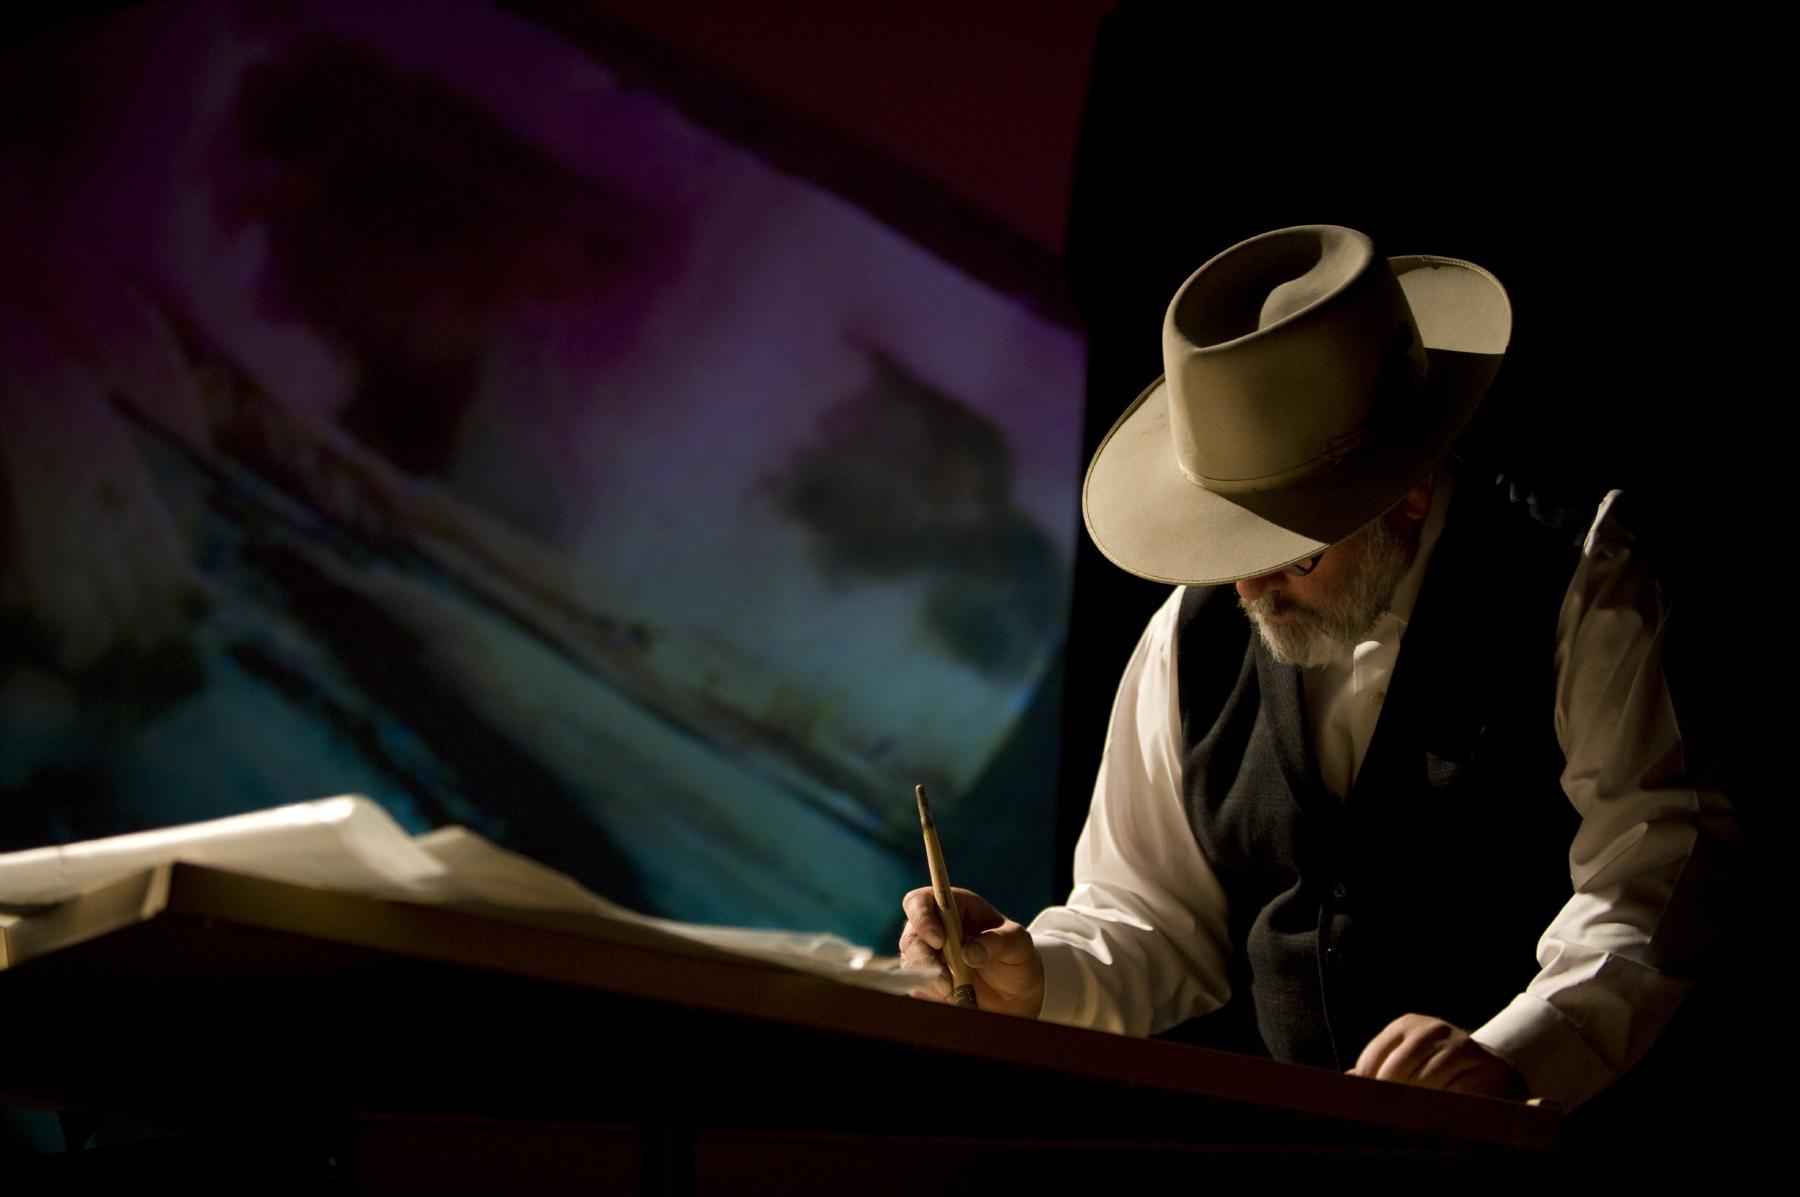 William Matthews, painting, photo by Jessica Brandi Lifland